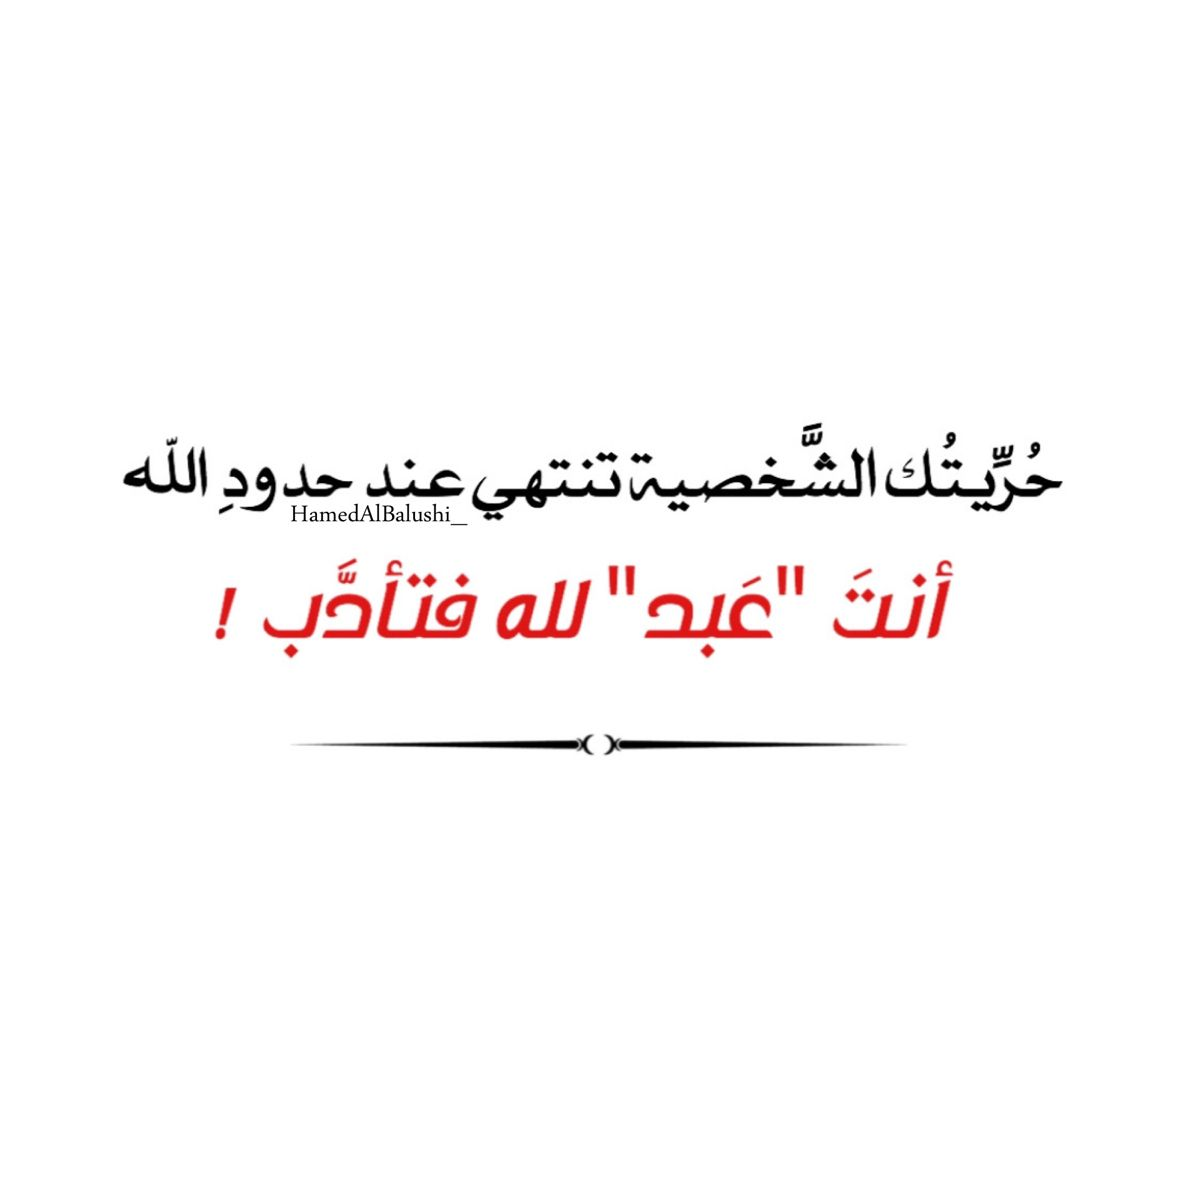 Pin By حمد البلوشي On حكمة Math Arabic Calligraphy Math Equations